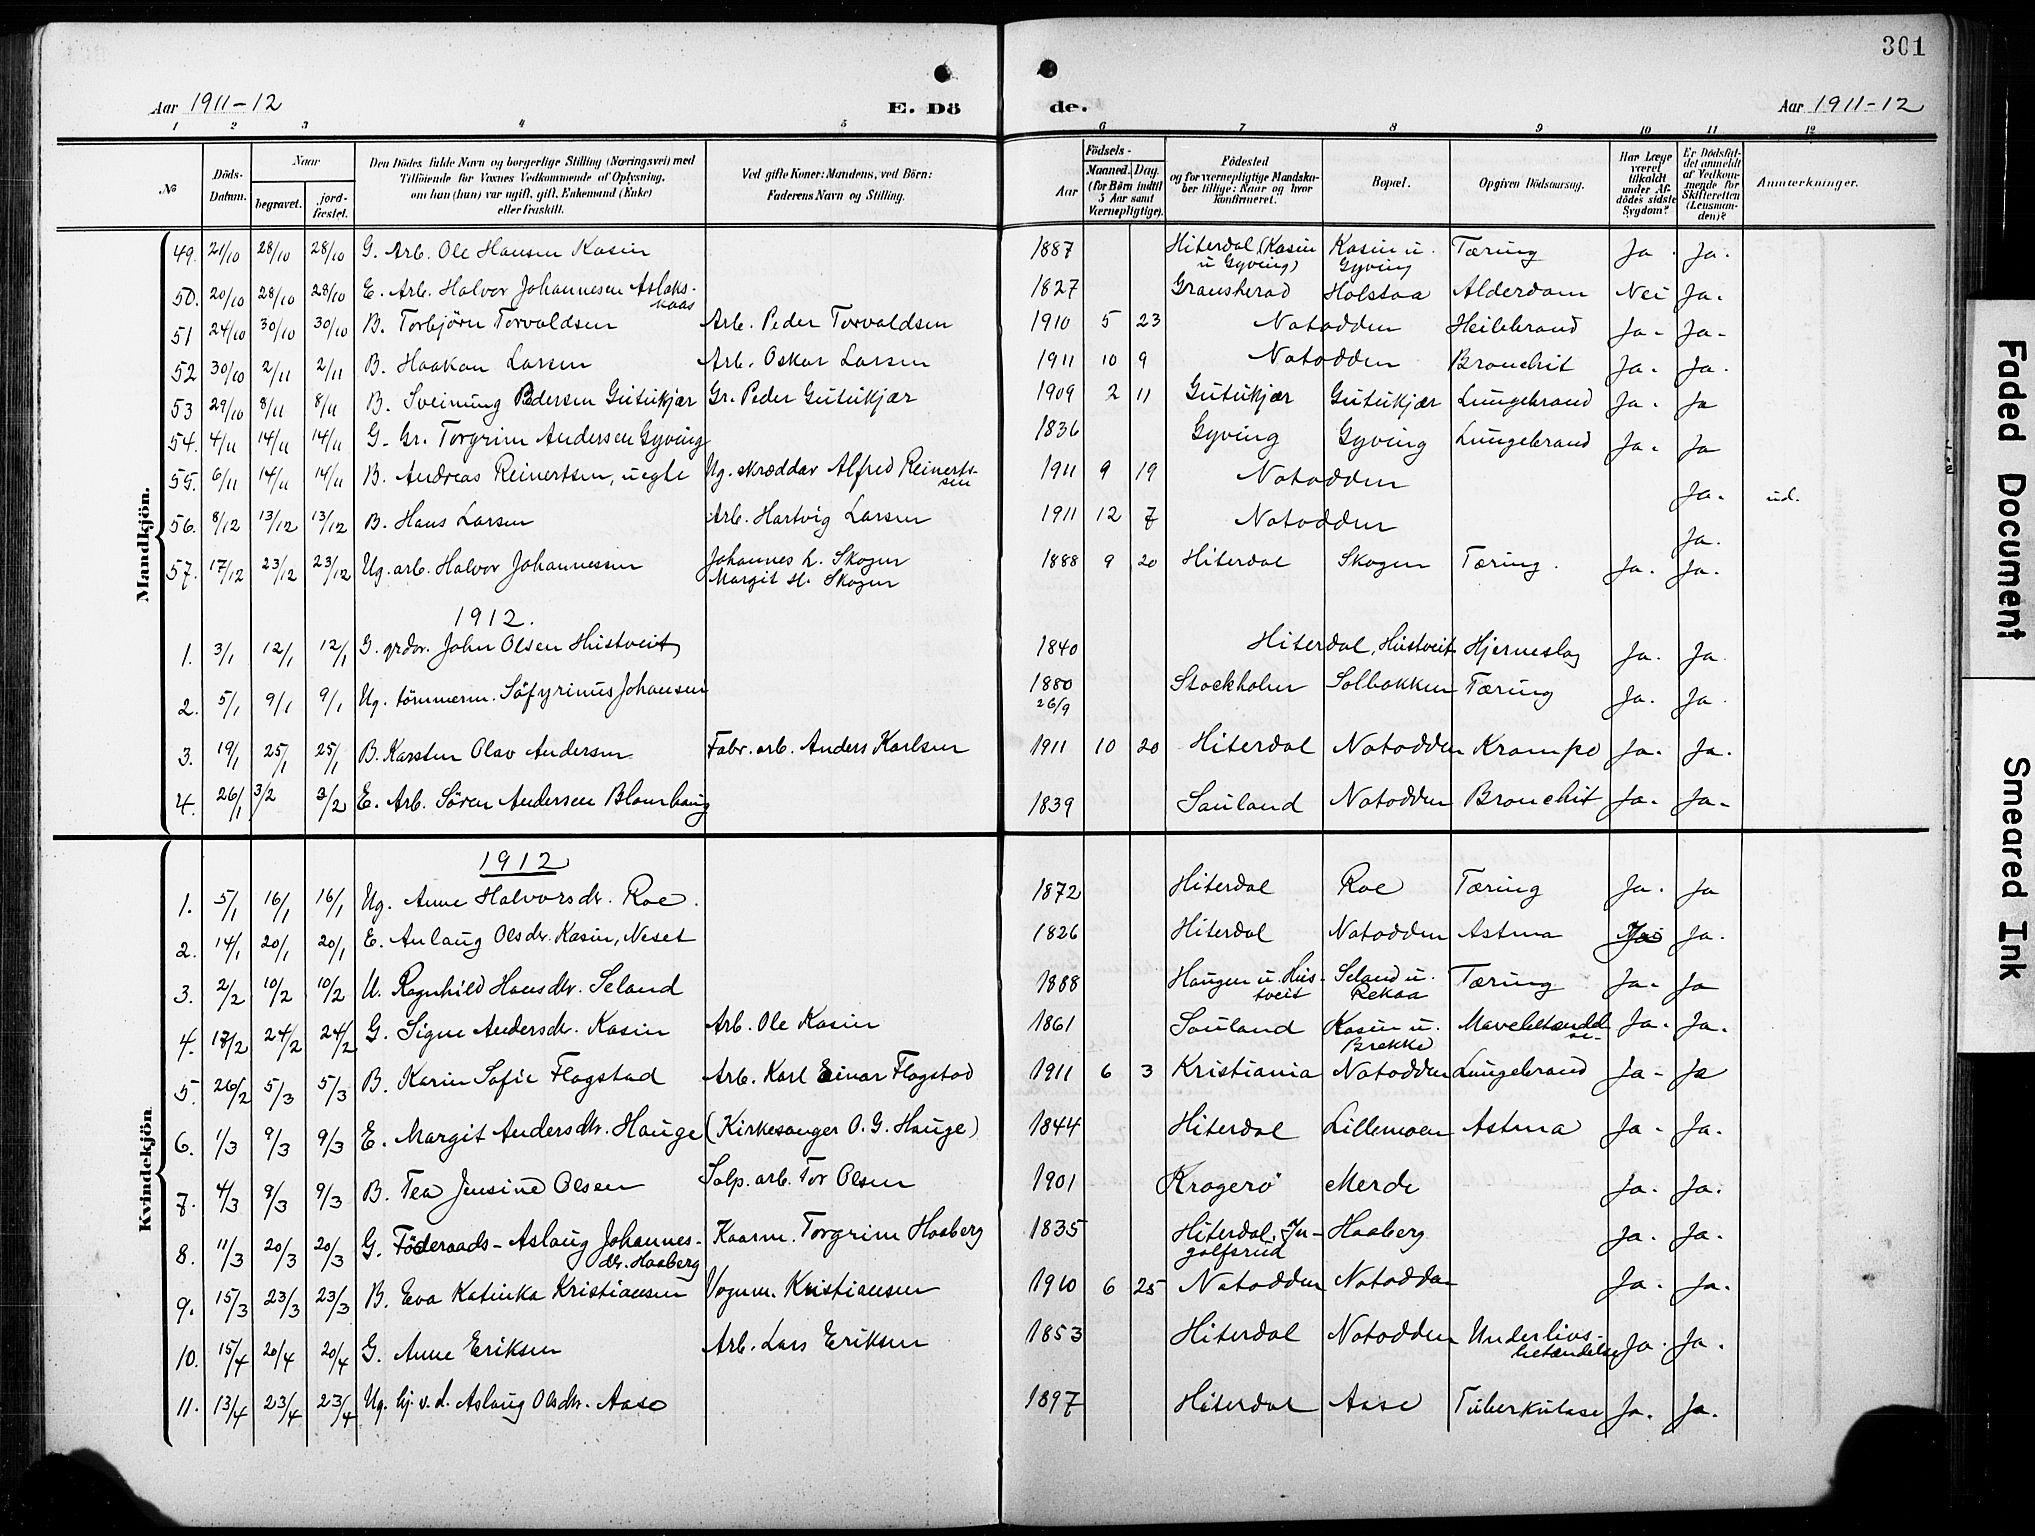 SAKO, Heddal kirkebøker, G/Ga/L0003: Klokkerbok nr. I 3, 1908-1932, s. 301